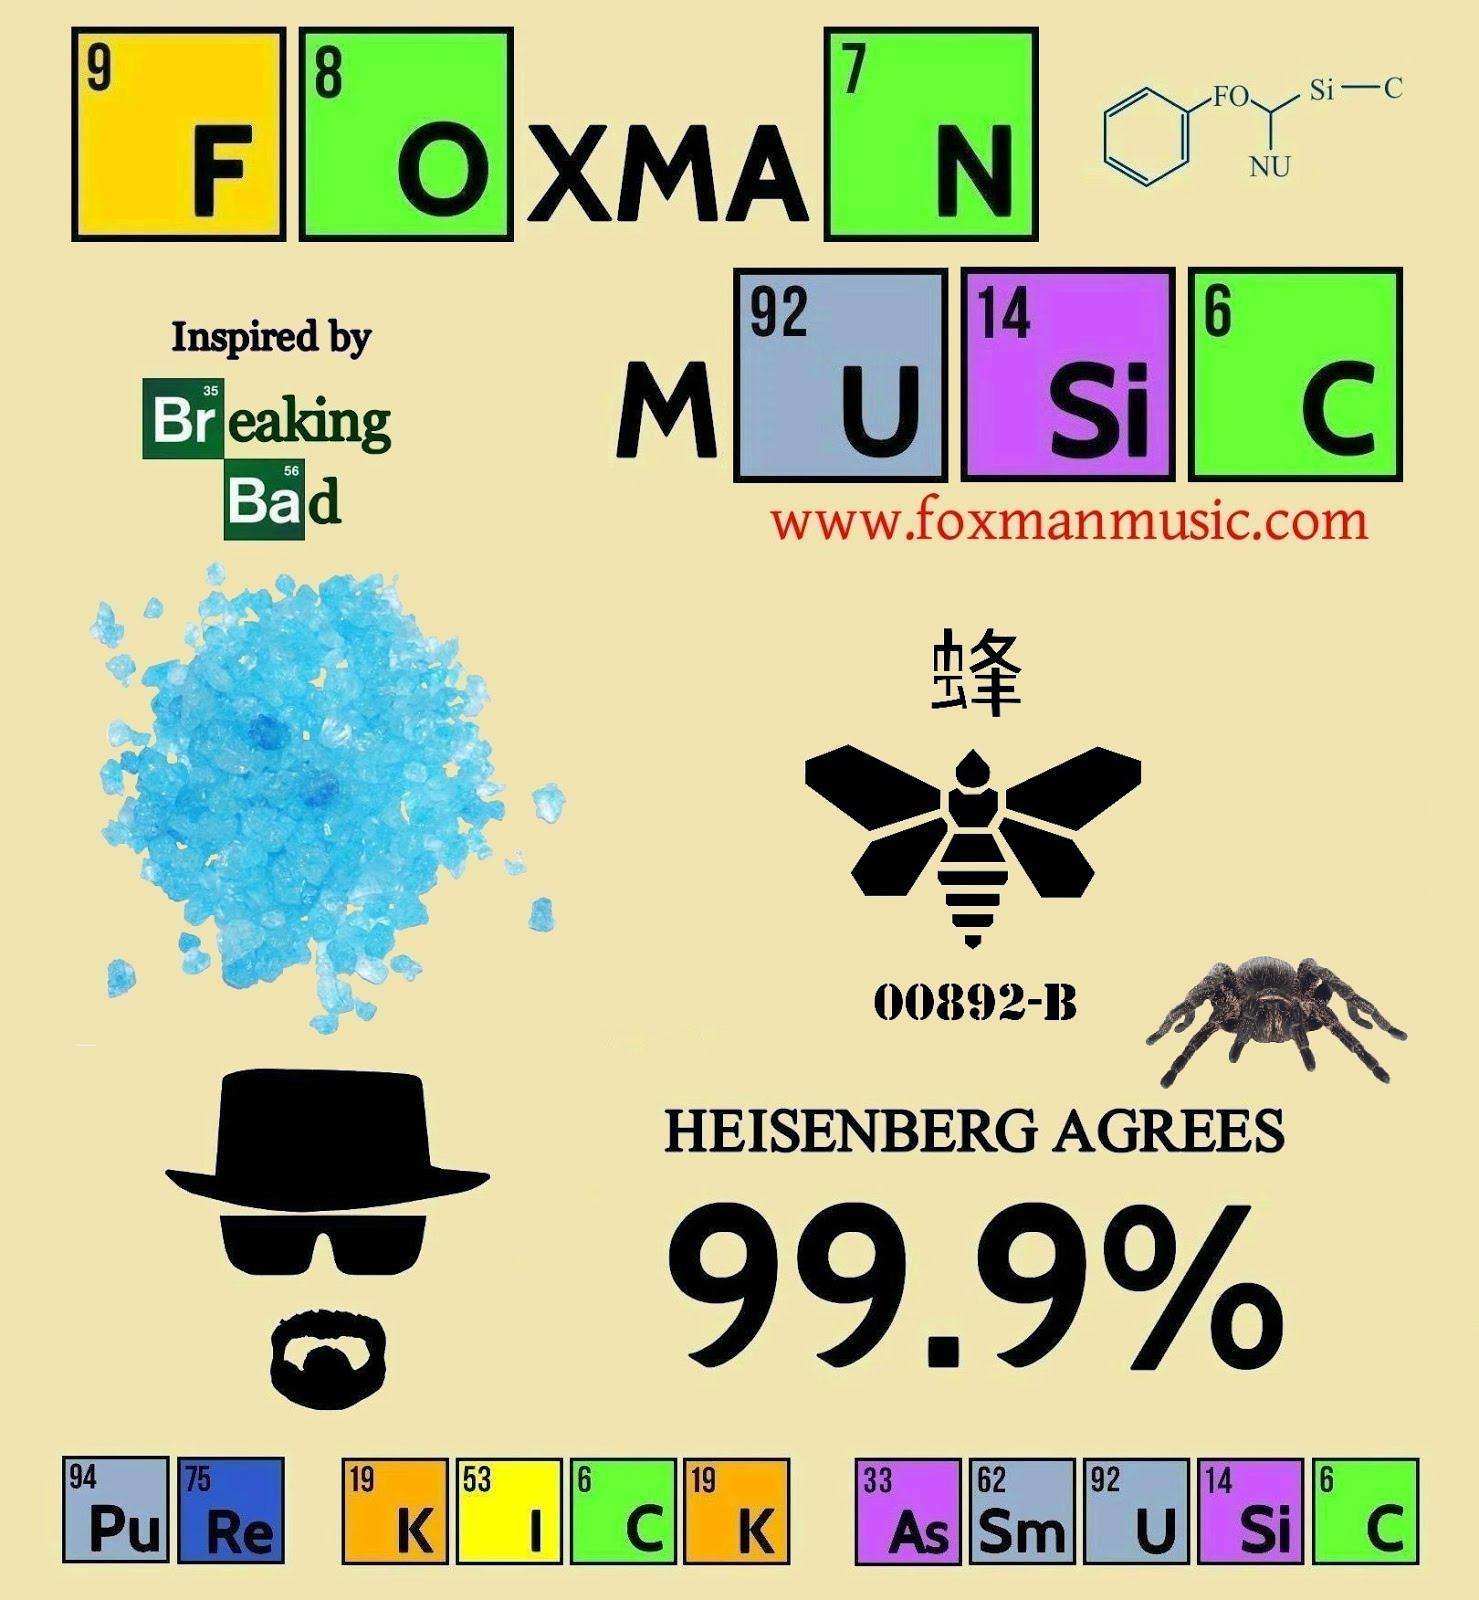 Foxman Promo Flyers